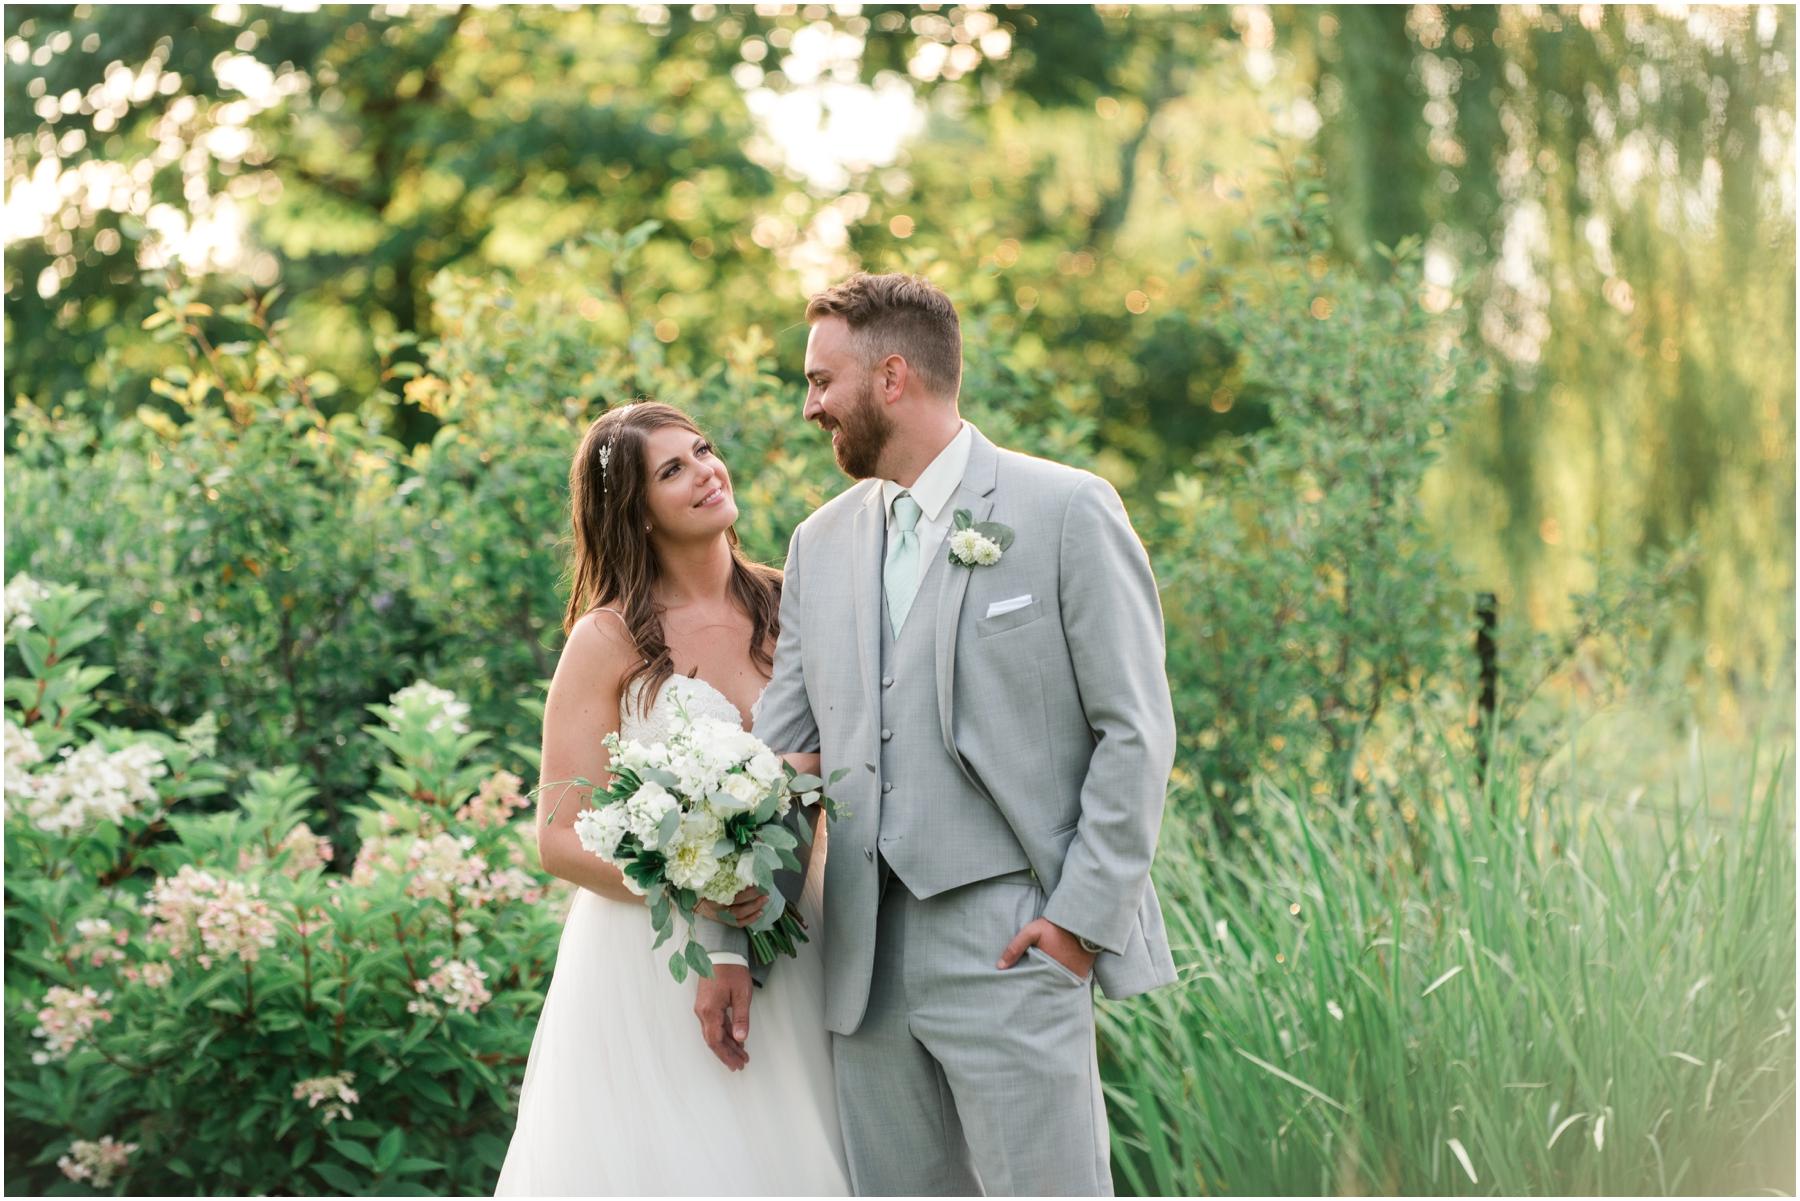 Bloom Field Gardens Wedding Precious Photography_0407